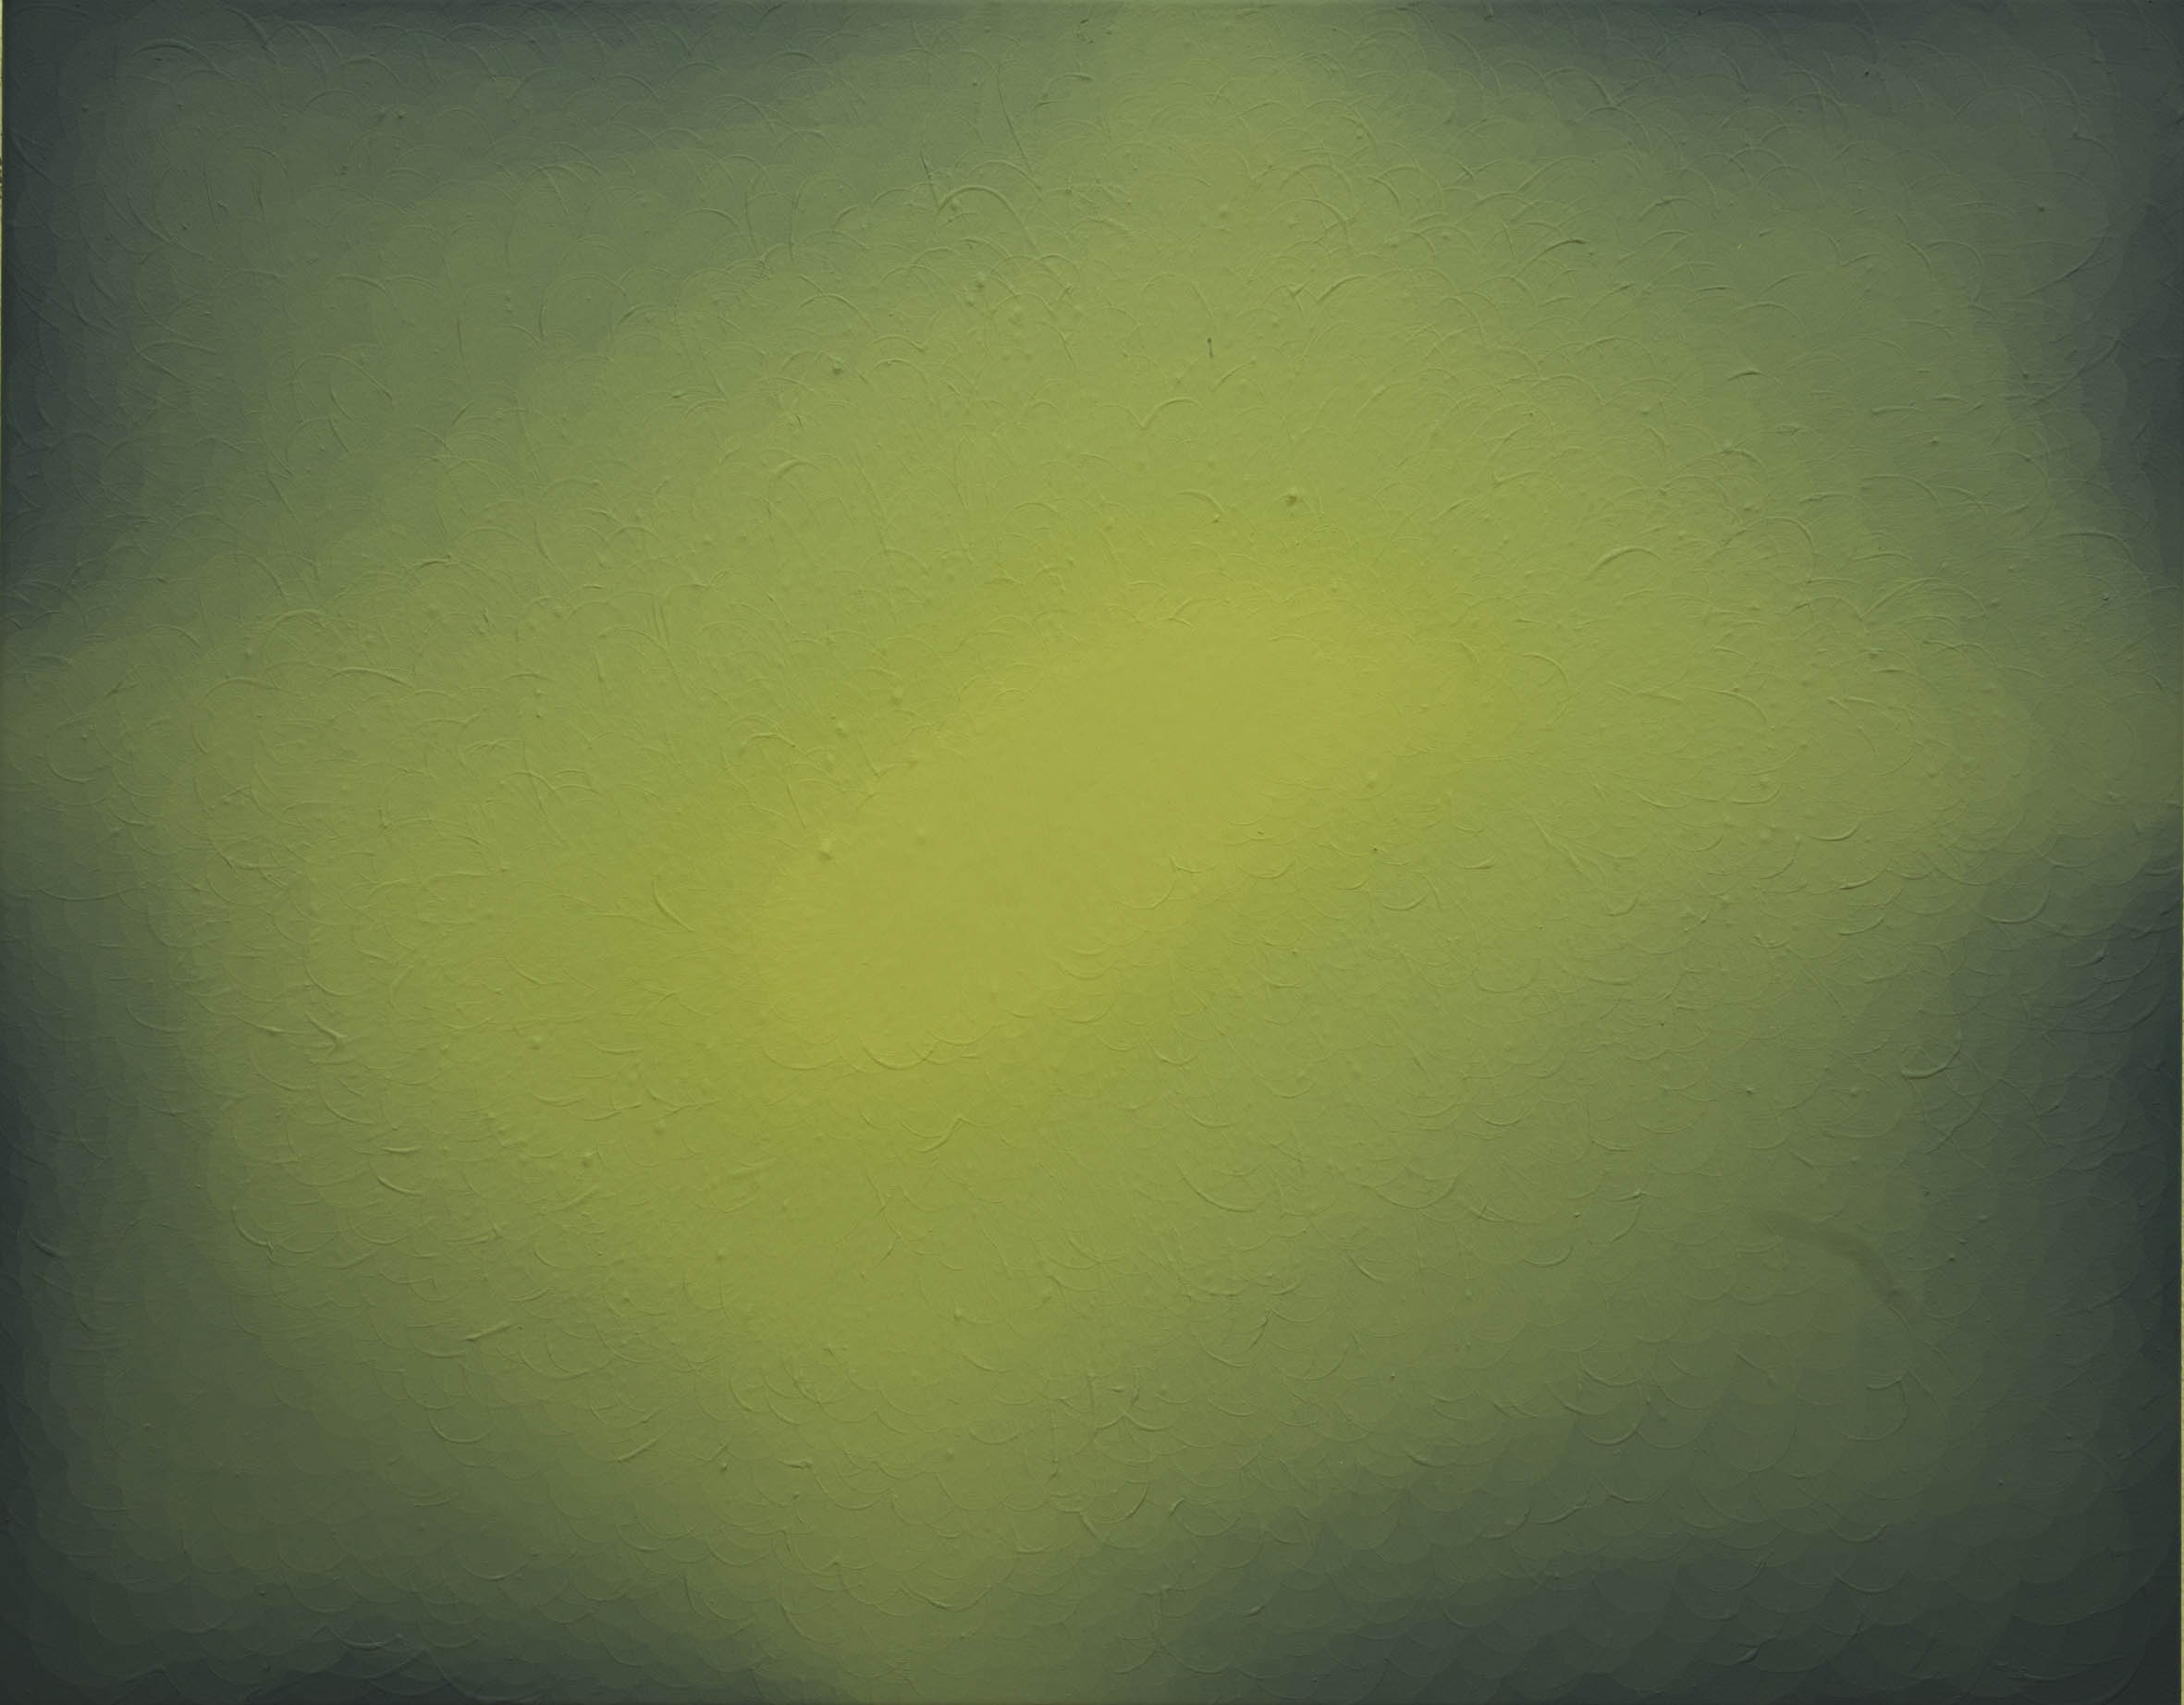 S/T, 2013, acrílico sobre lienzo, 75 x 95 cm.